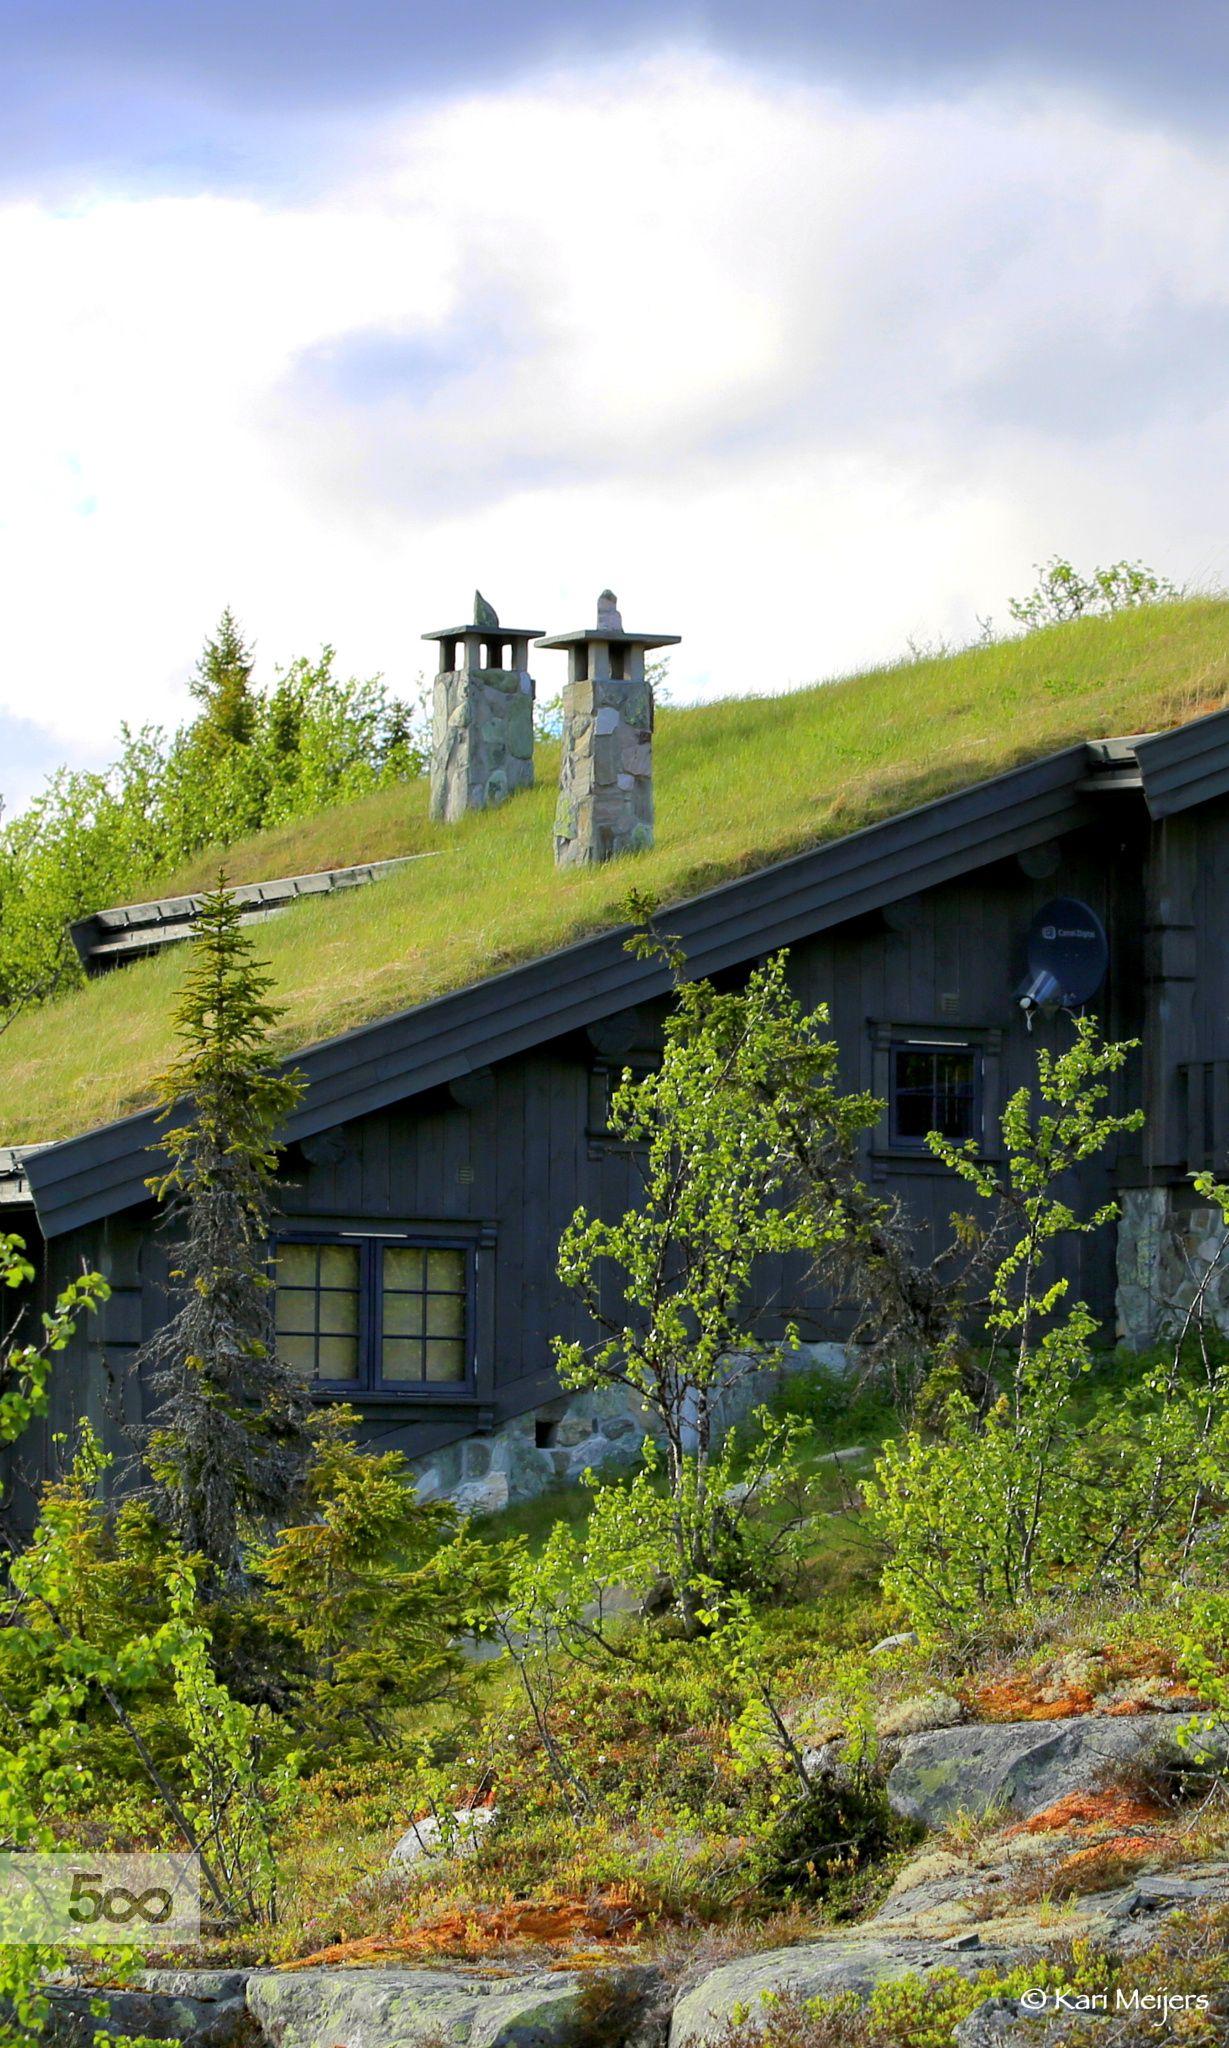 Beitost Len, Norway By Kari Meijers On 500Px - Refugios